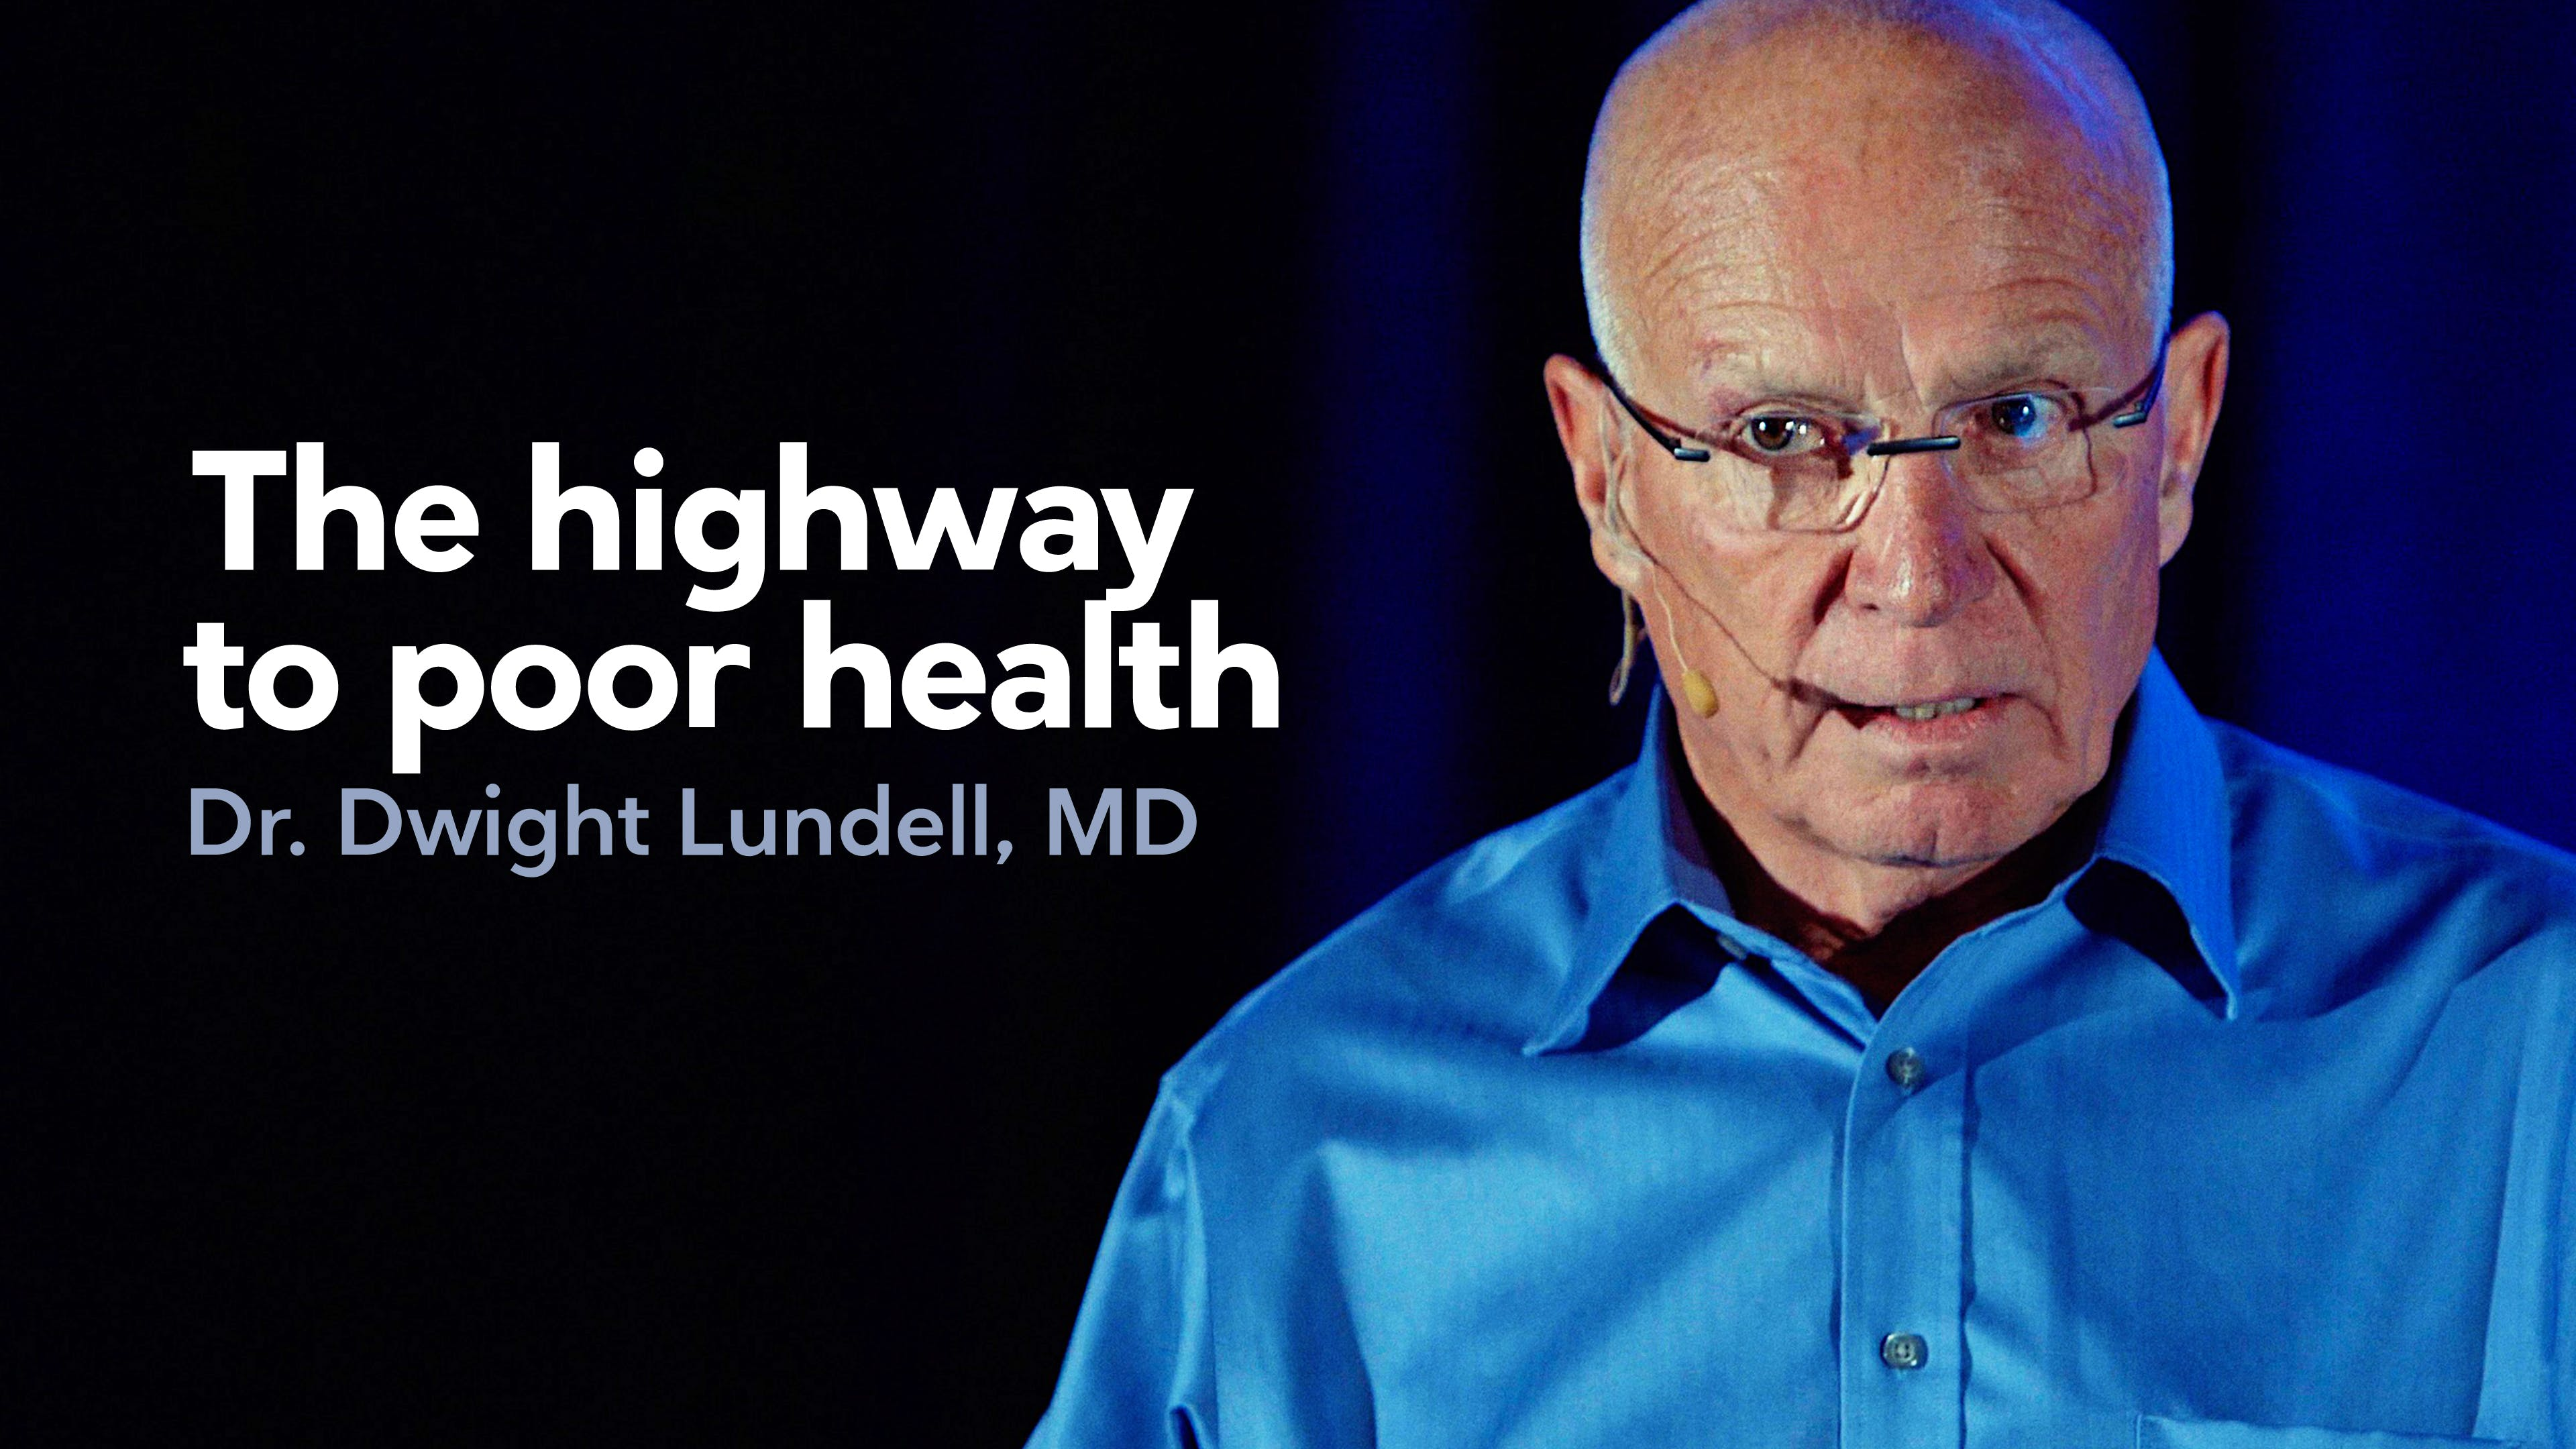 The highway to poor health